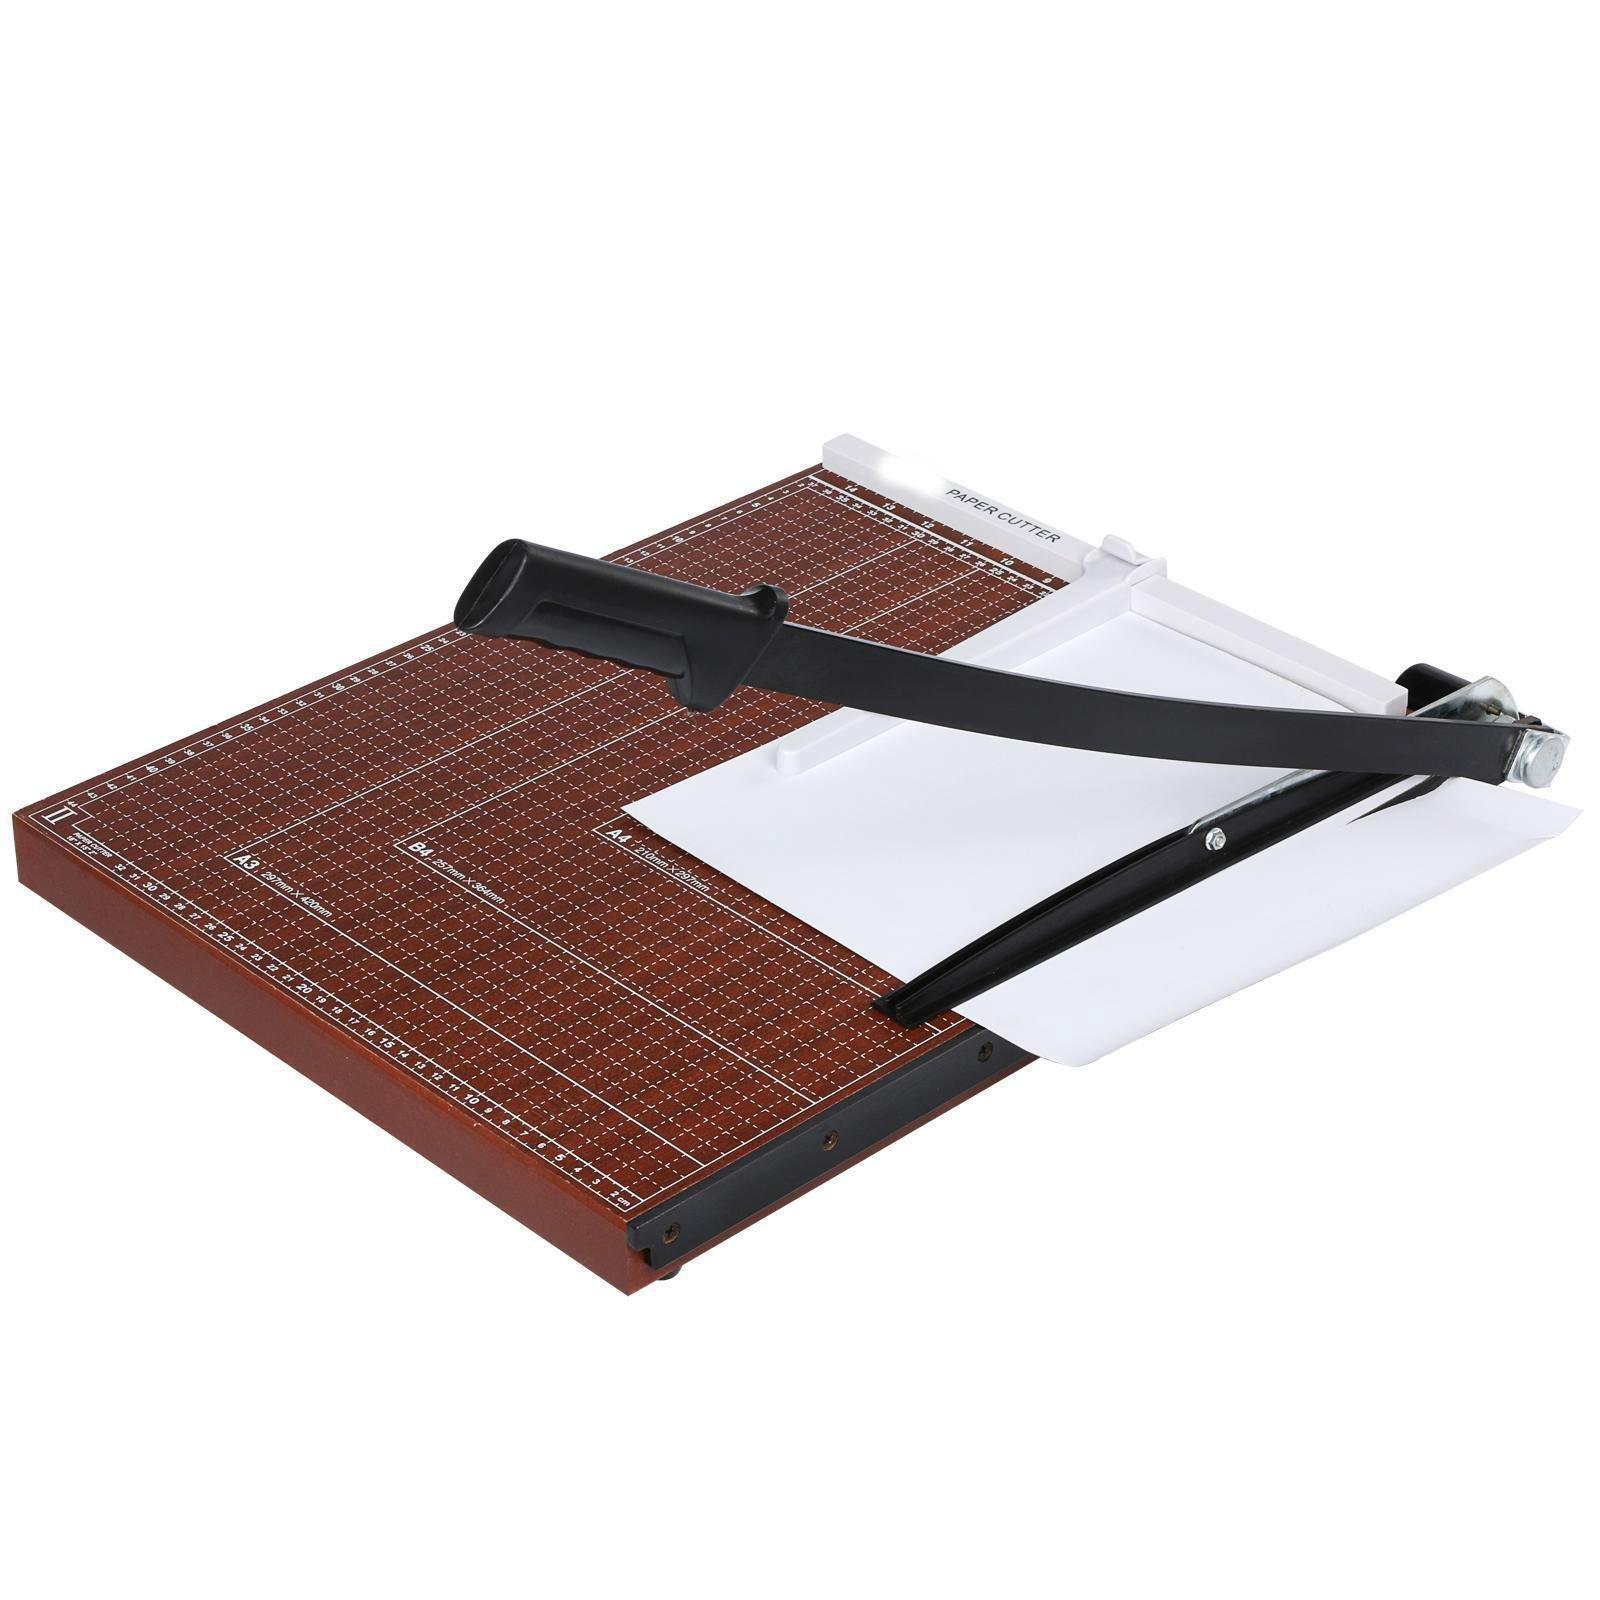 Kindsells Wooden Professional Office Home A2-B7 Paper Desk Tops Paper Cutter Trimmer Scrap Machine